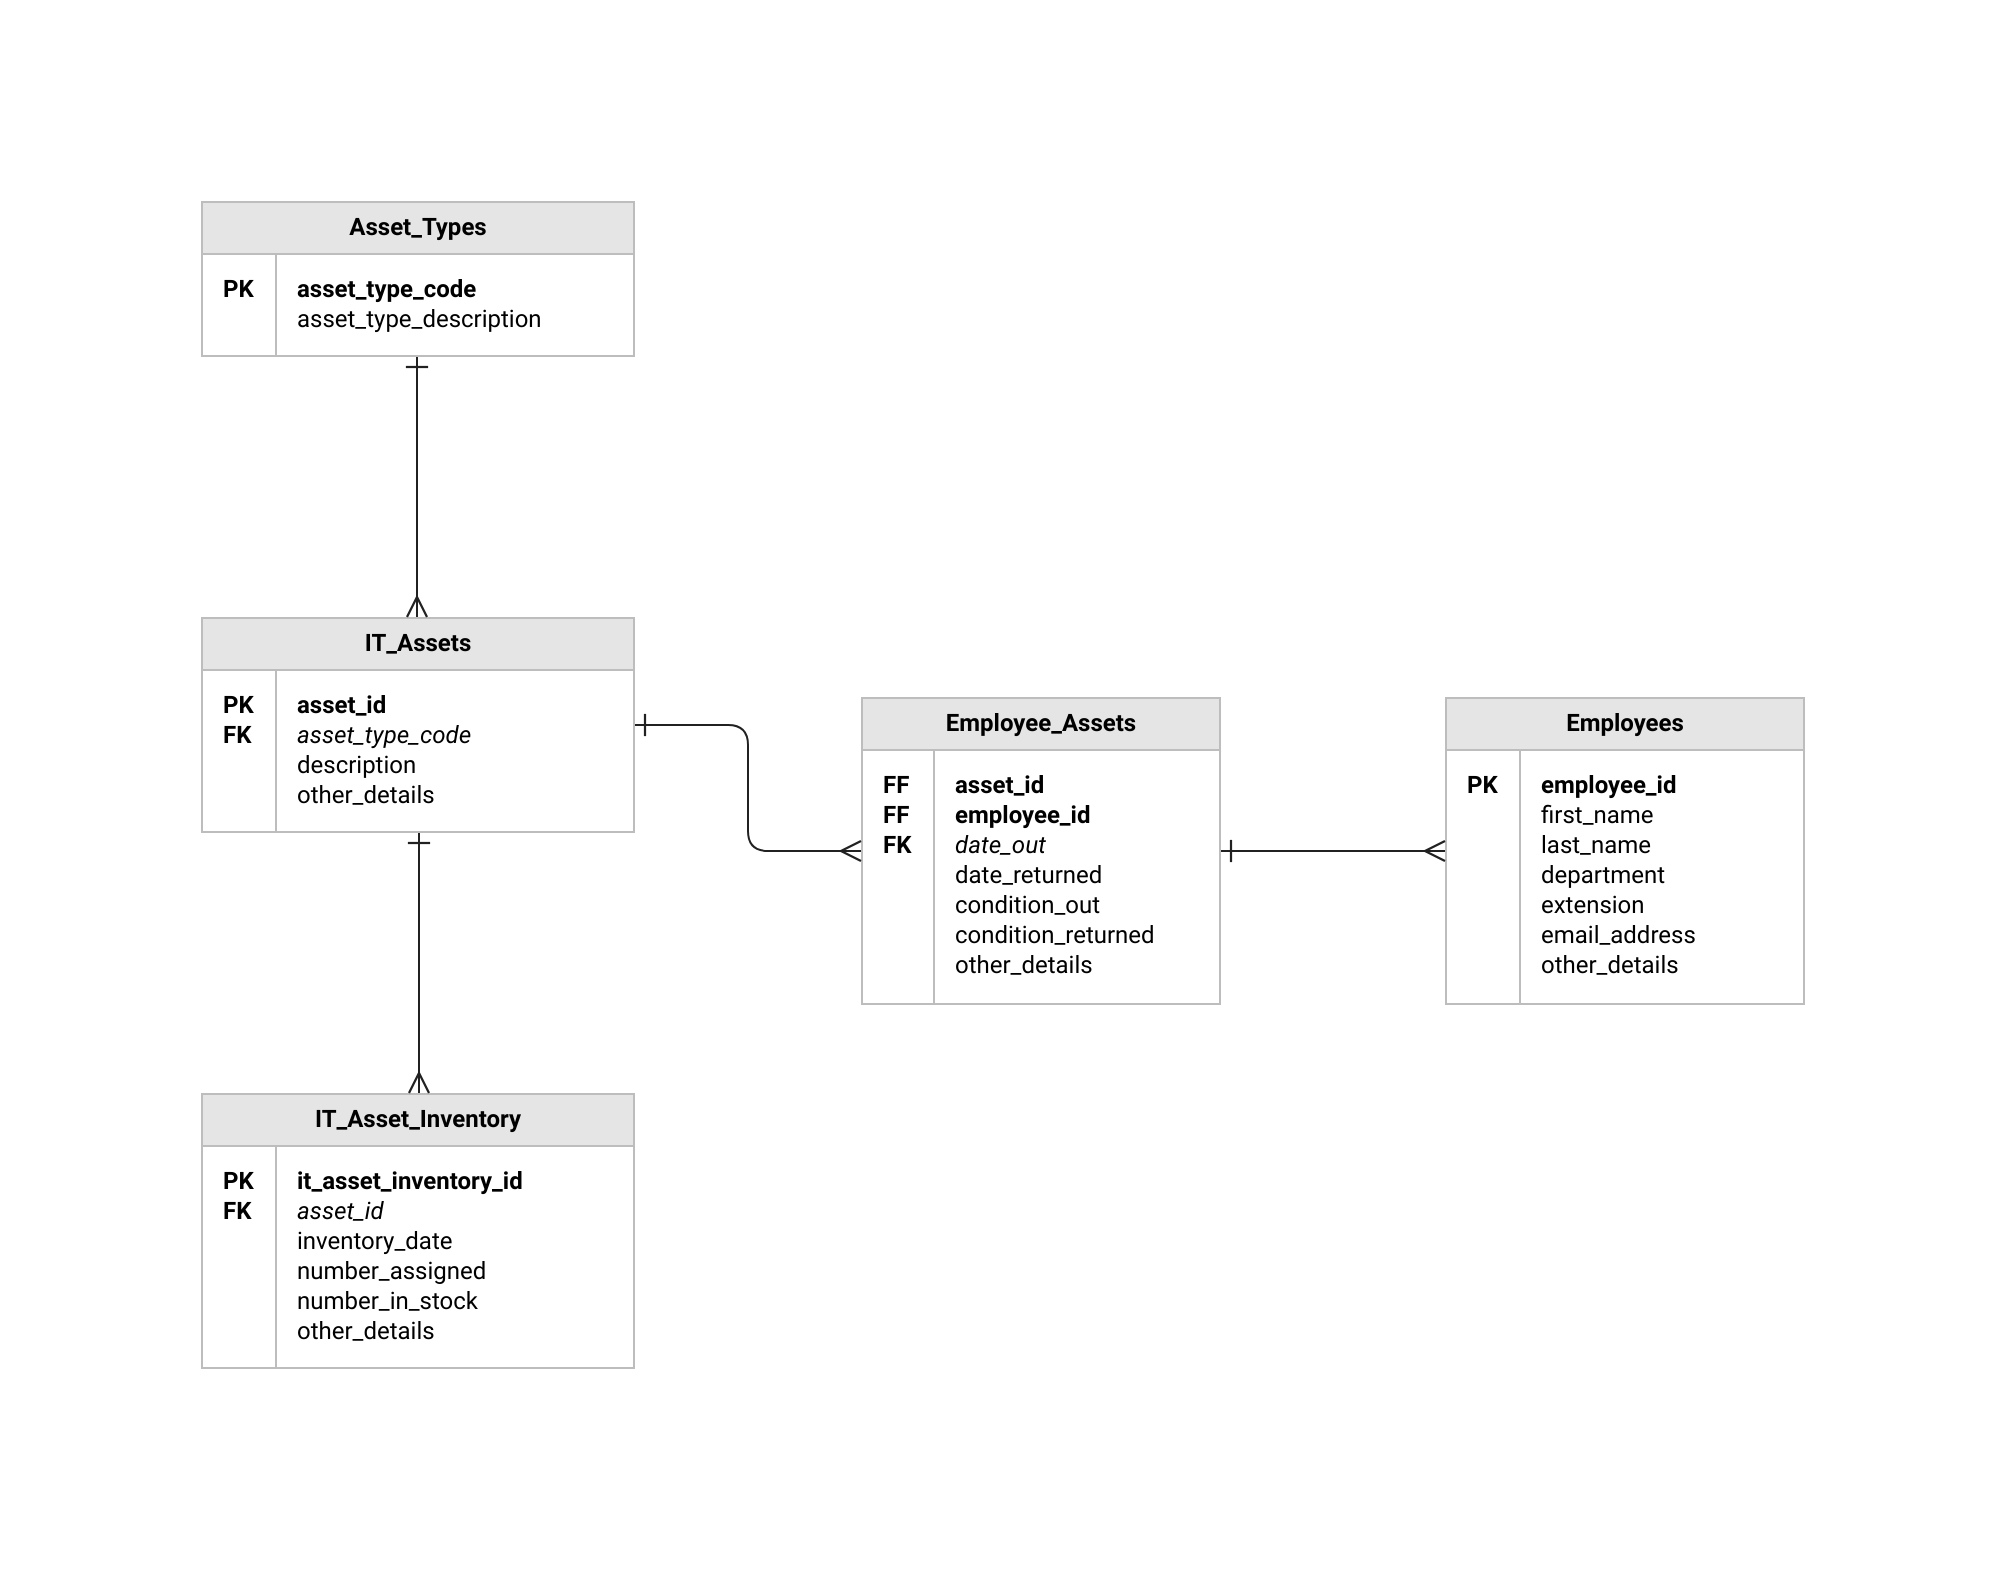 Erd Templates   Er Diagram Examples   Moqups with regard to Er Diagram Description